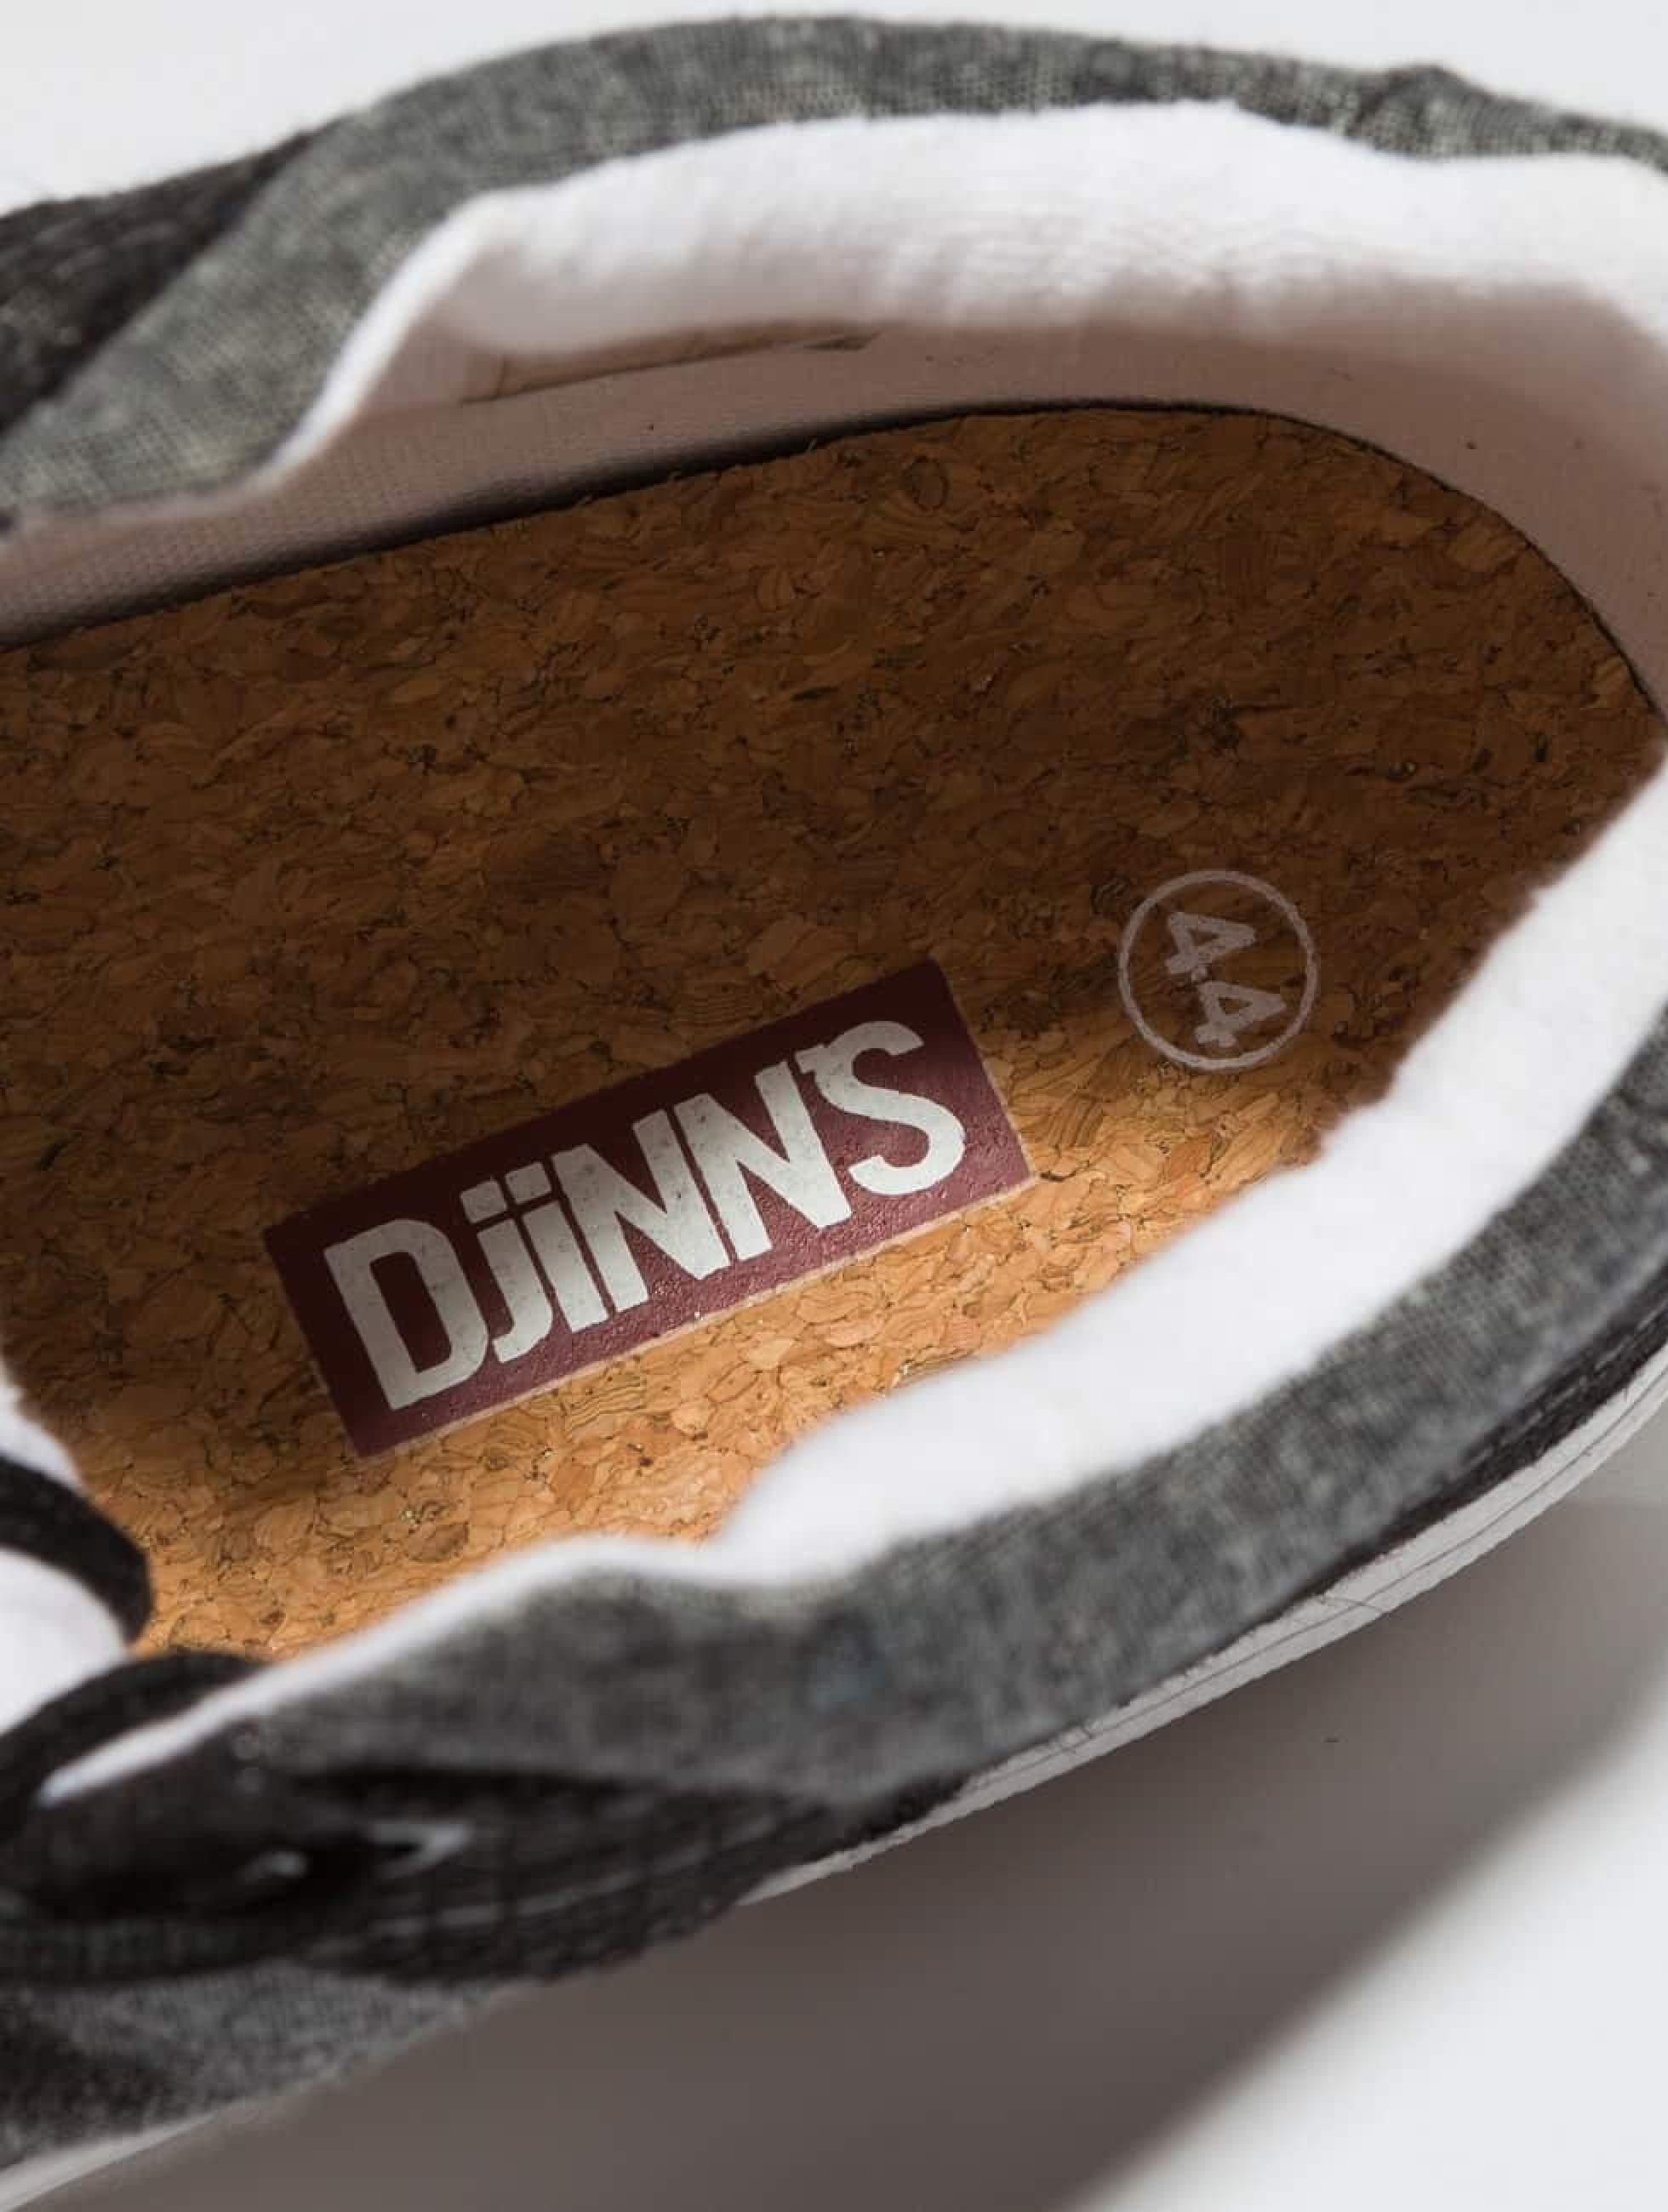 Djinns Herren Sneaker Schuhe / Sneaker Herren  Chunk Oxybast eee6a5